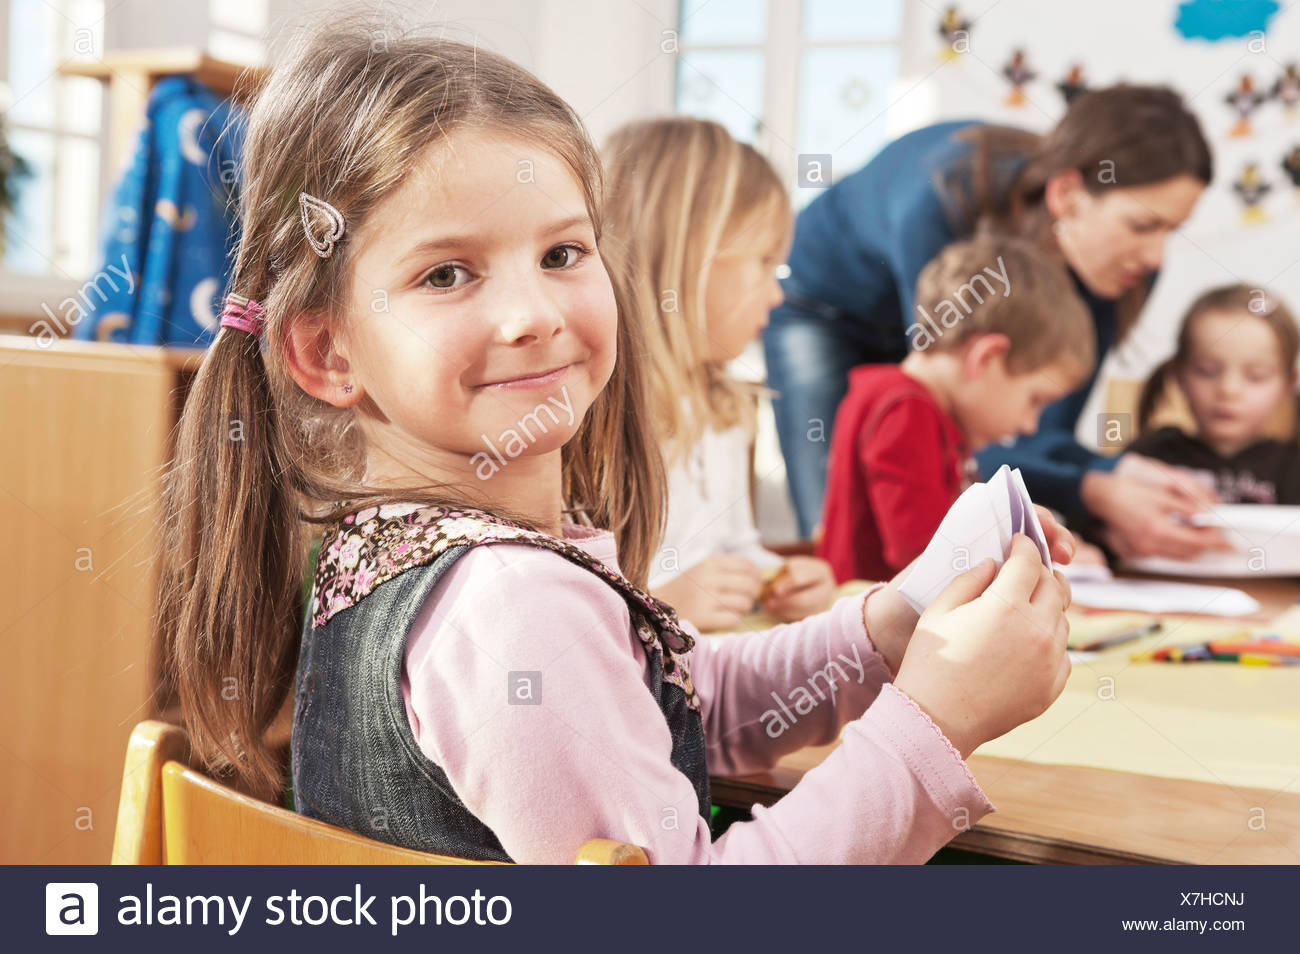 Children In Nursery School, Kottgeisering, Bavaria, Germany, Europe - Stock Image